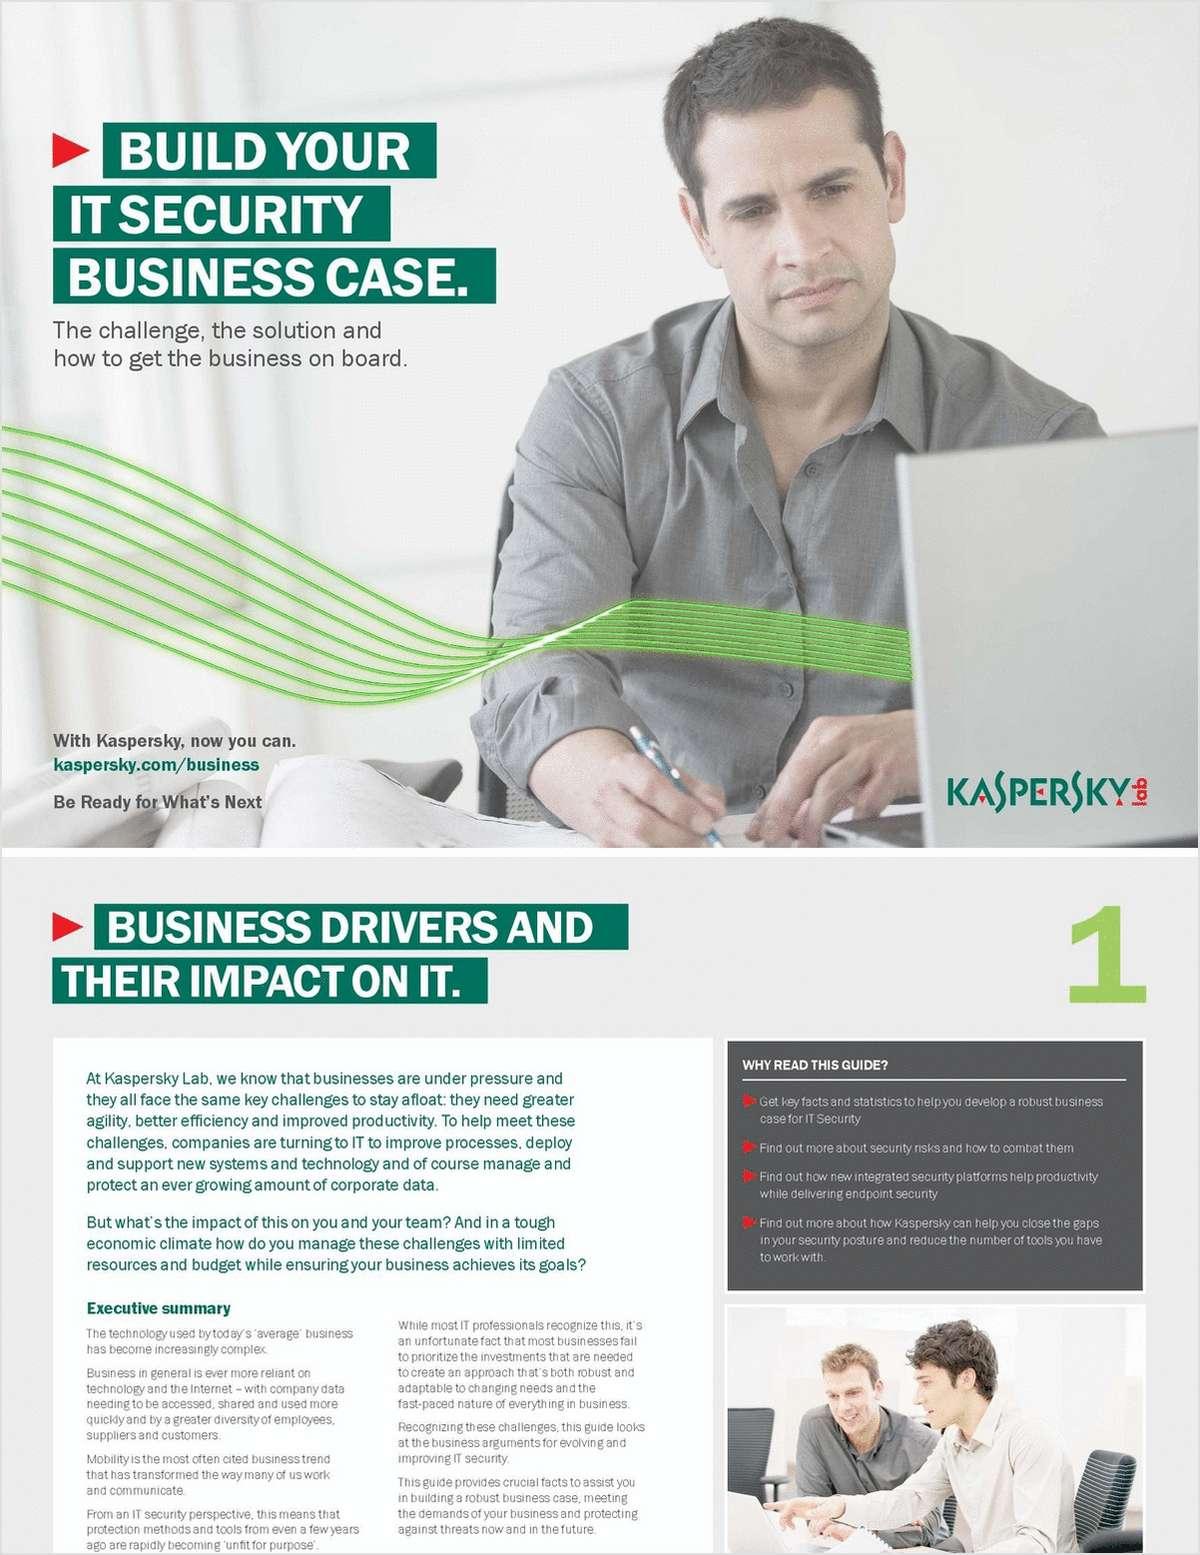 Build Your IT Security Case